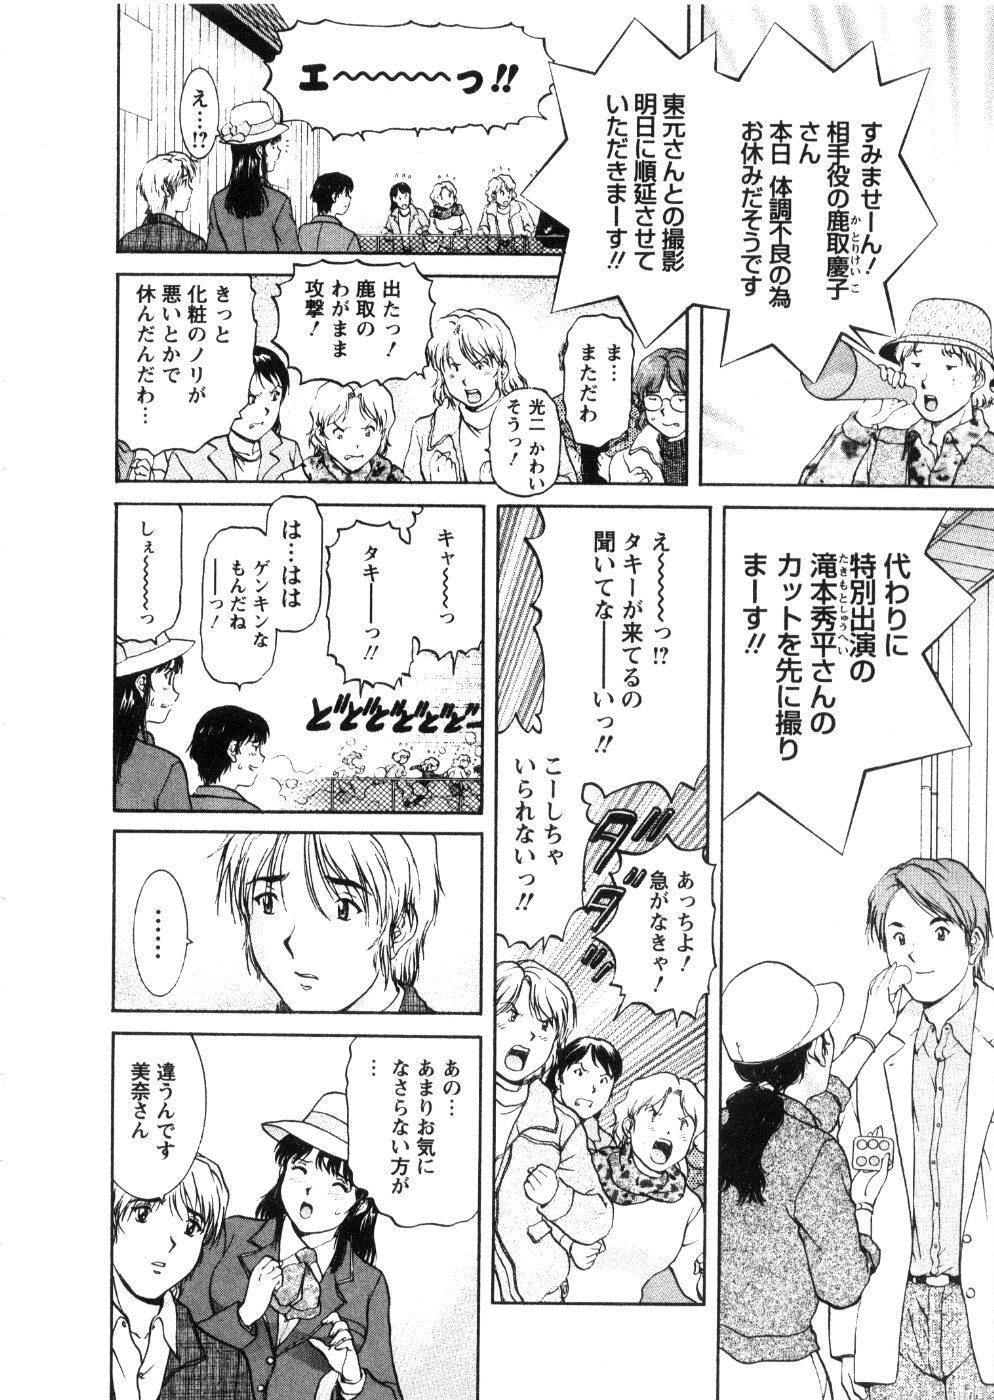 Oneechan-tachi ga Yatte Kuru 03 155